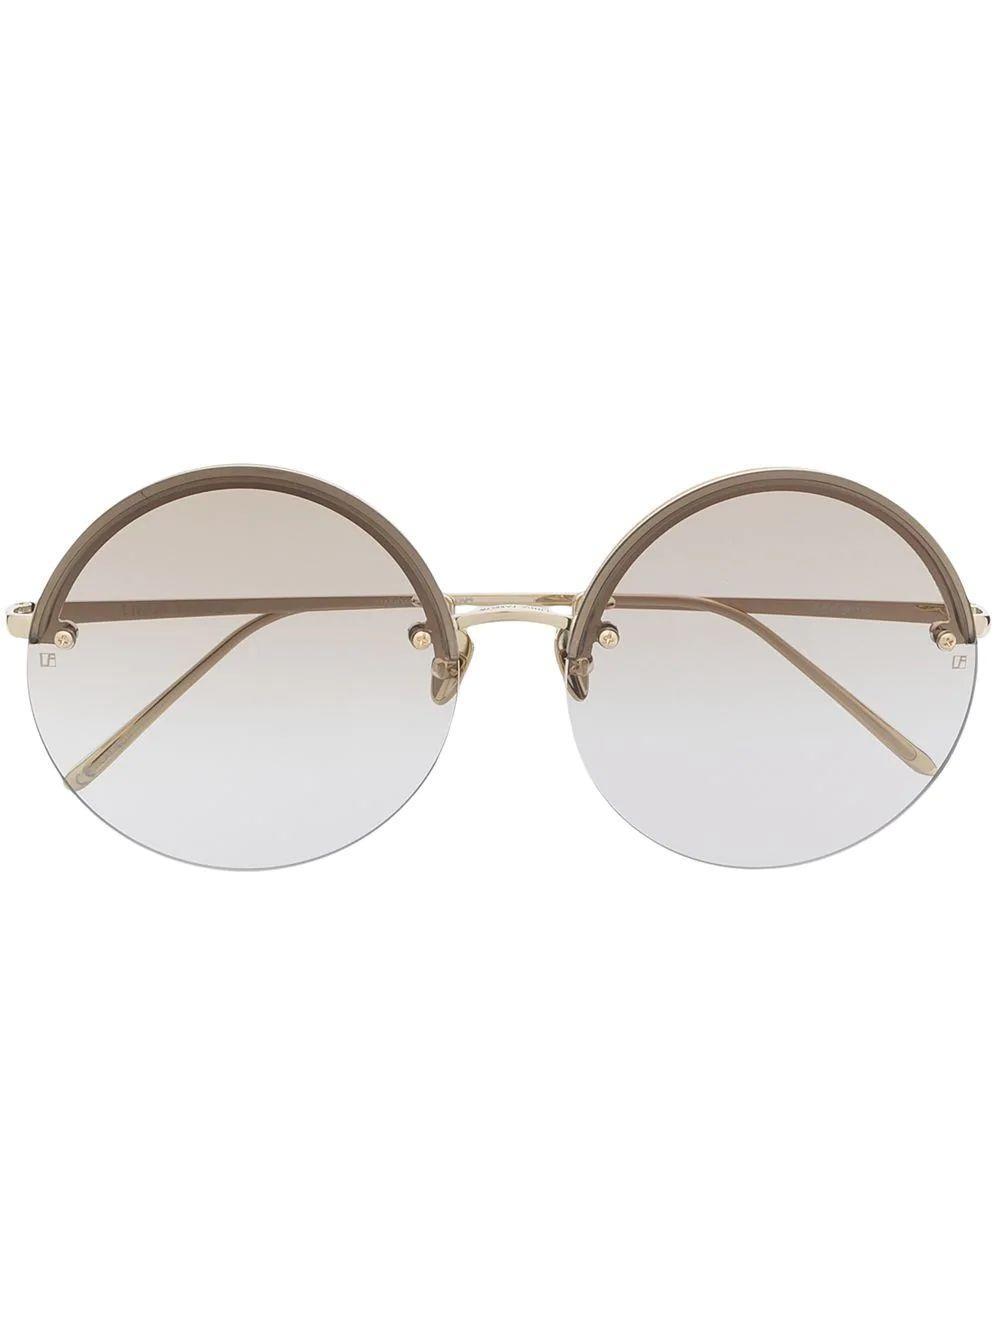 Adrienne Round Sunglasses Item # LFL1097C4SUN-C